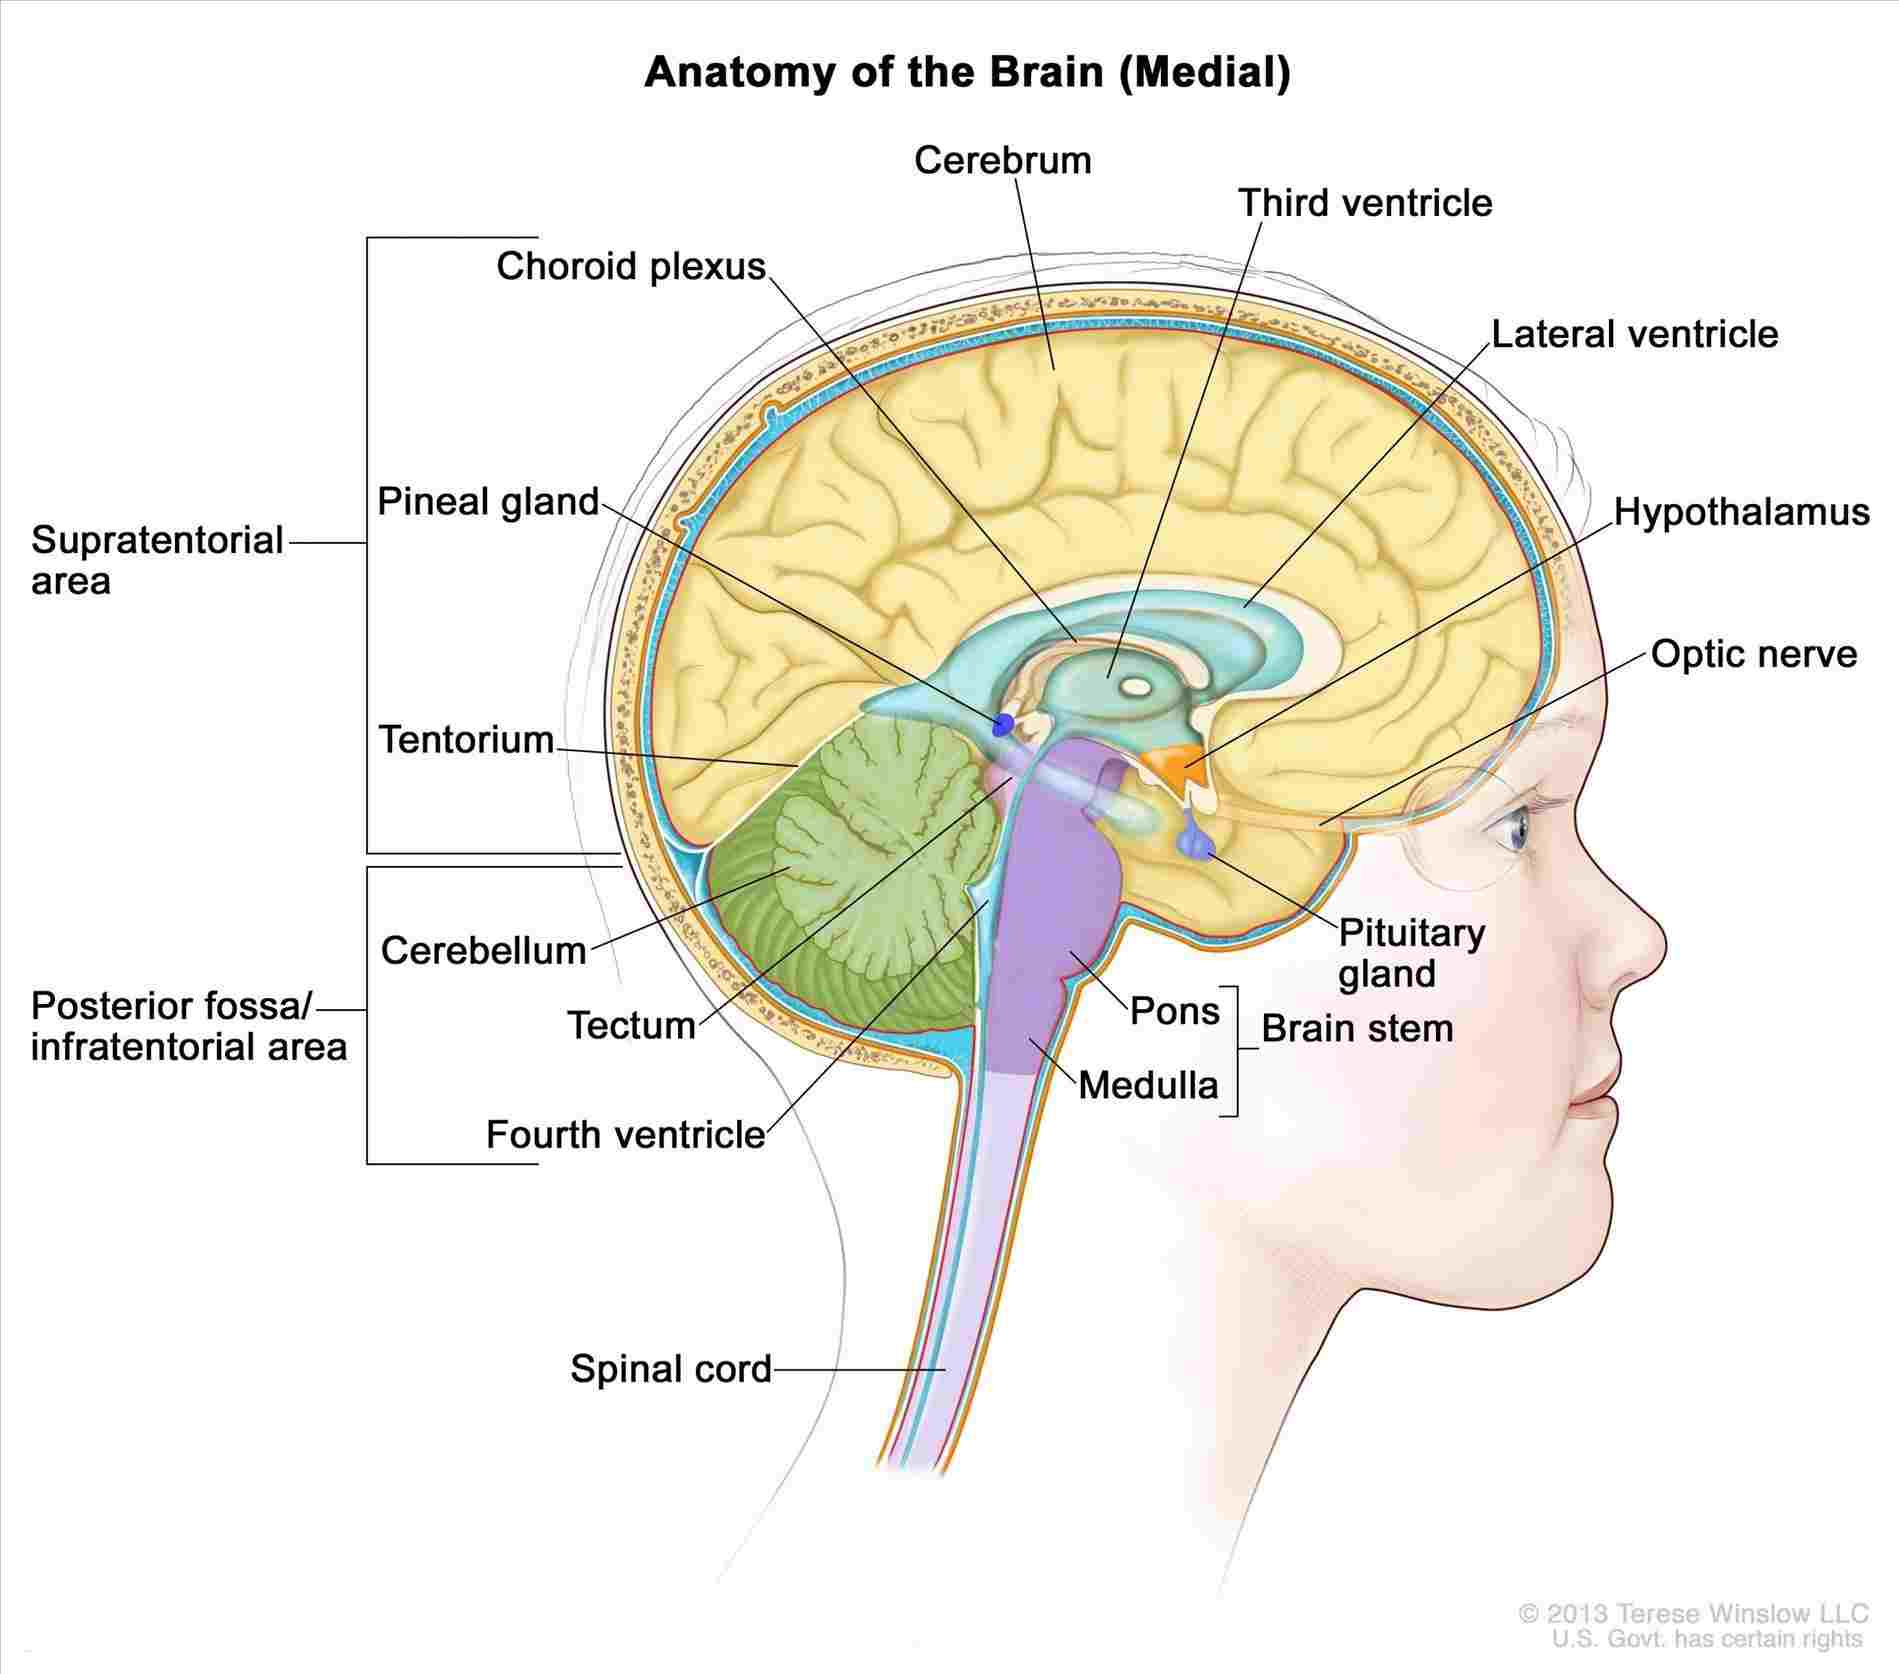 Brain Diagram Labeled Human Brain Anatomy Diagram Labeled Diagram Of Anatomy